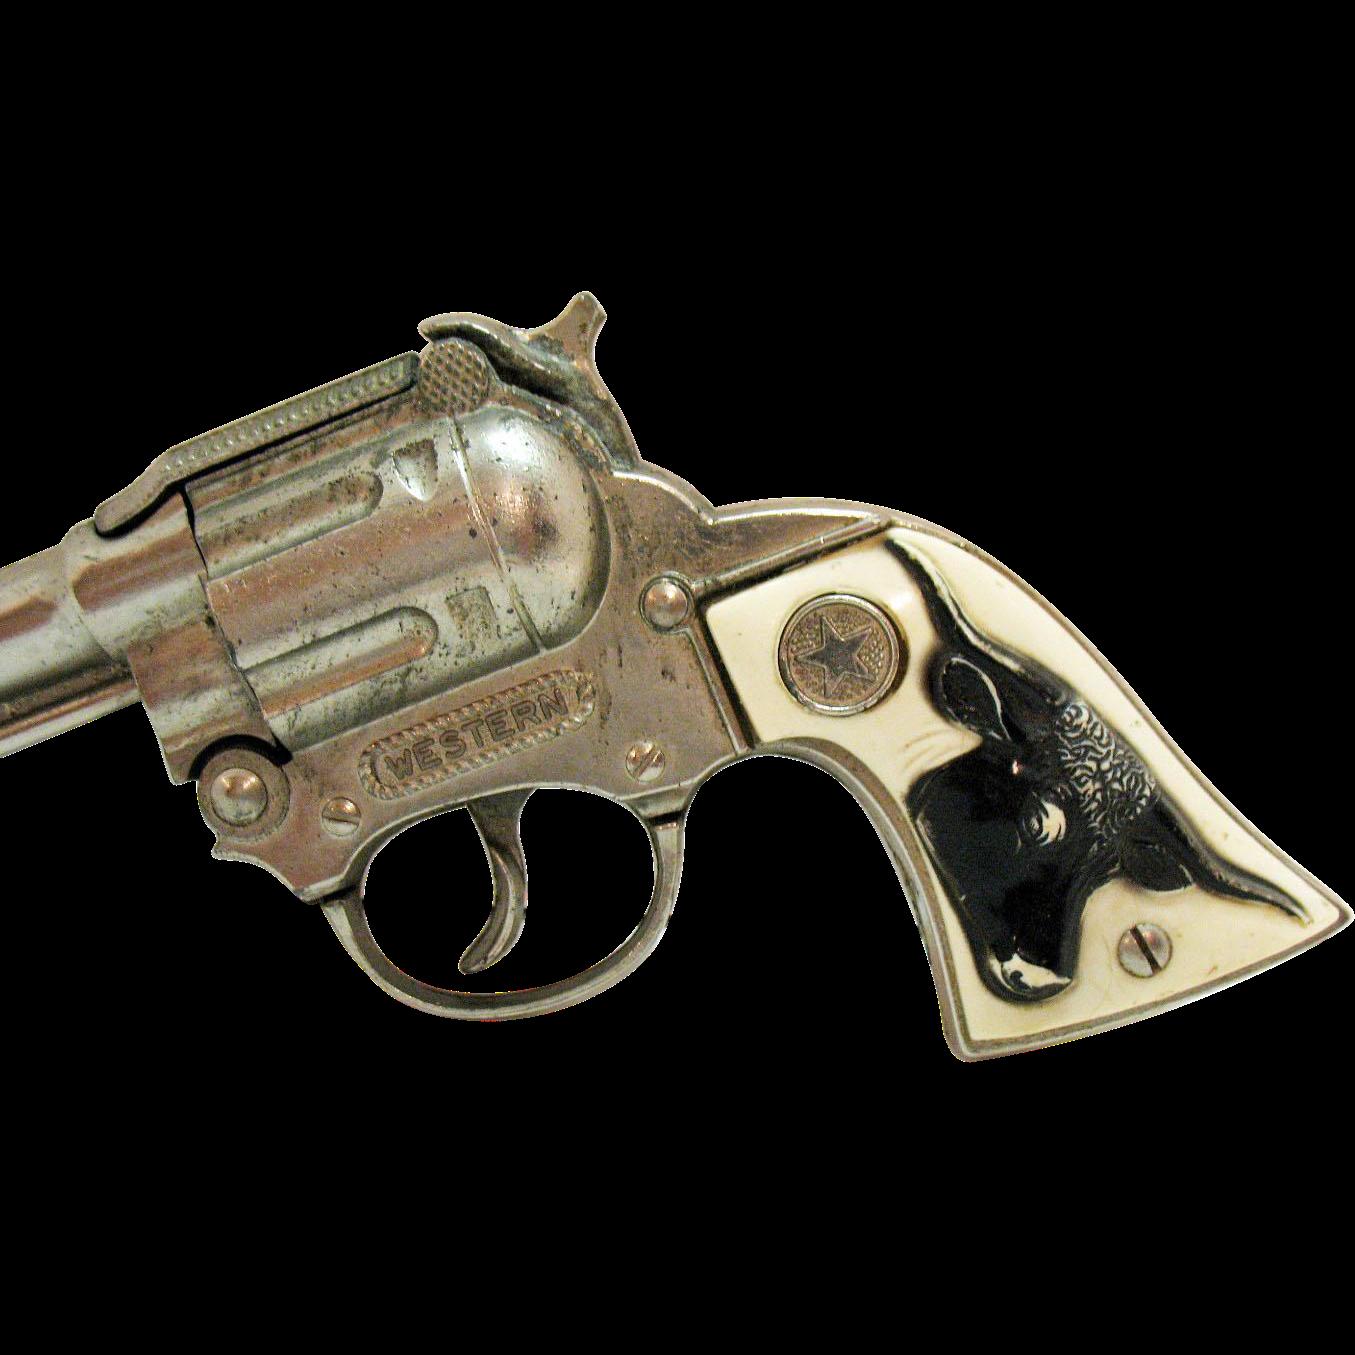 Vintage 1950s Hubley Western Metal Cap Gun For Spare Parts